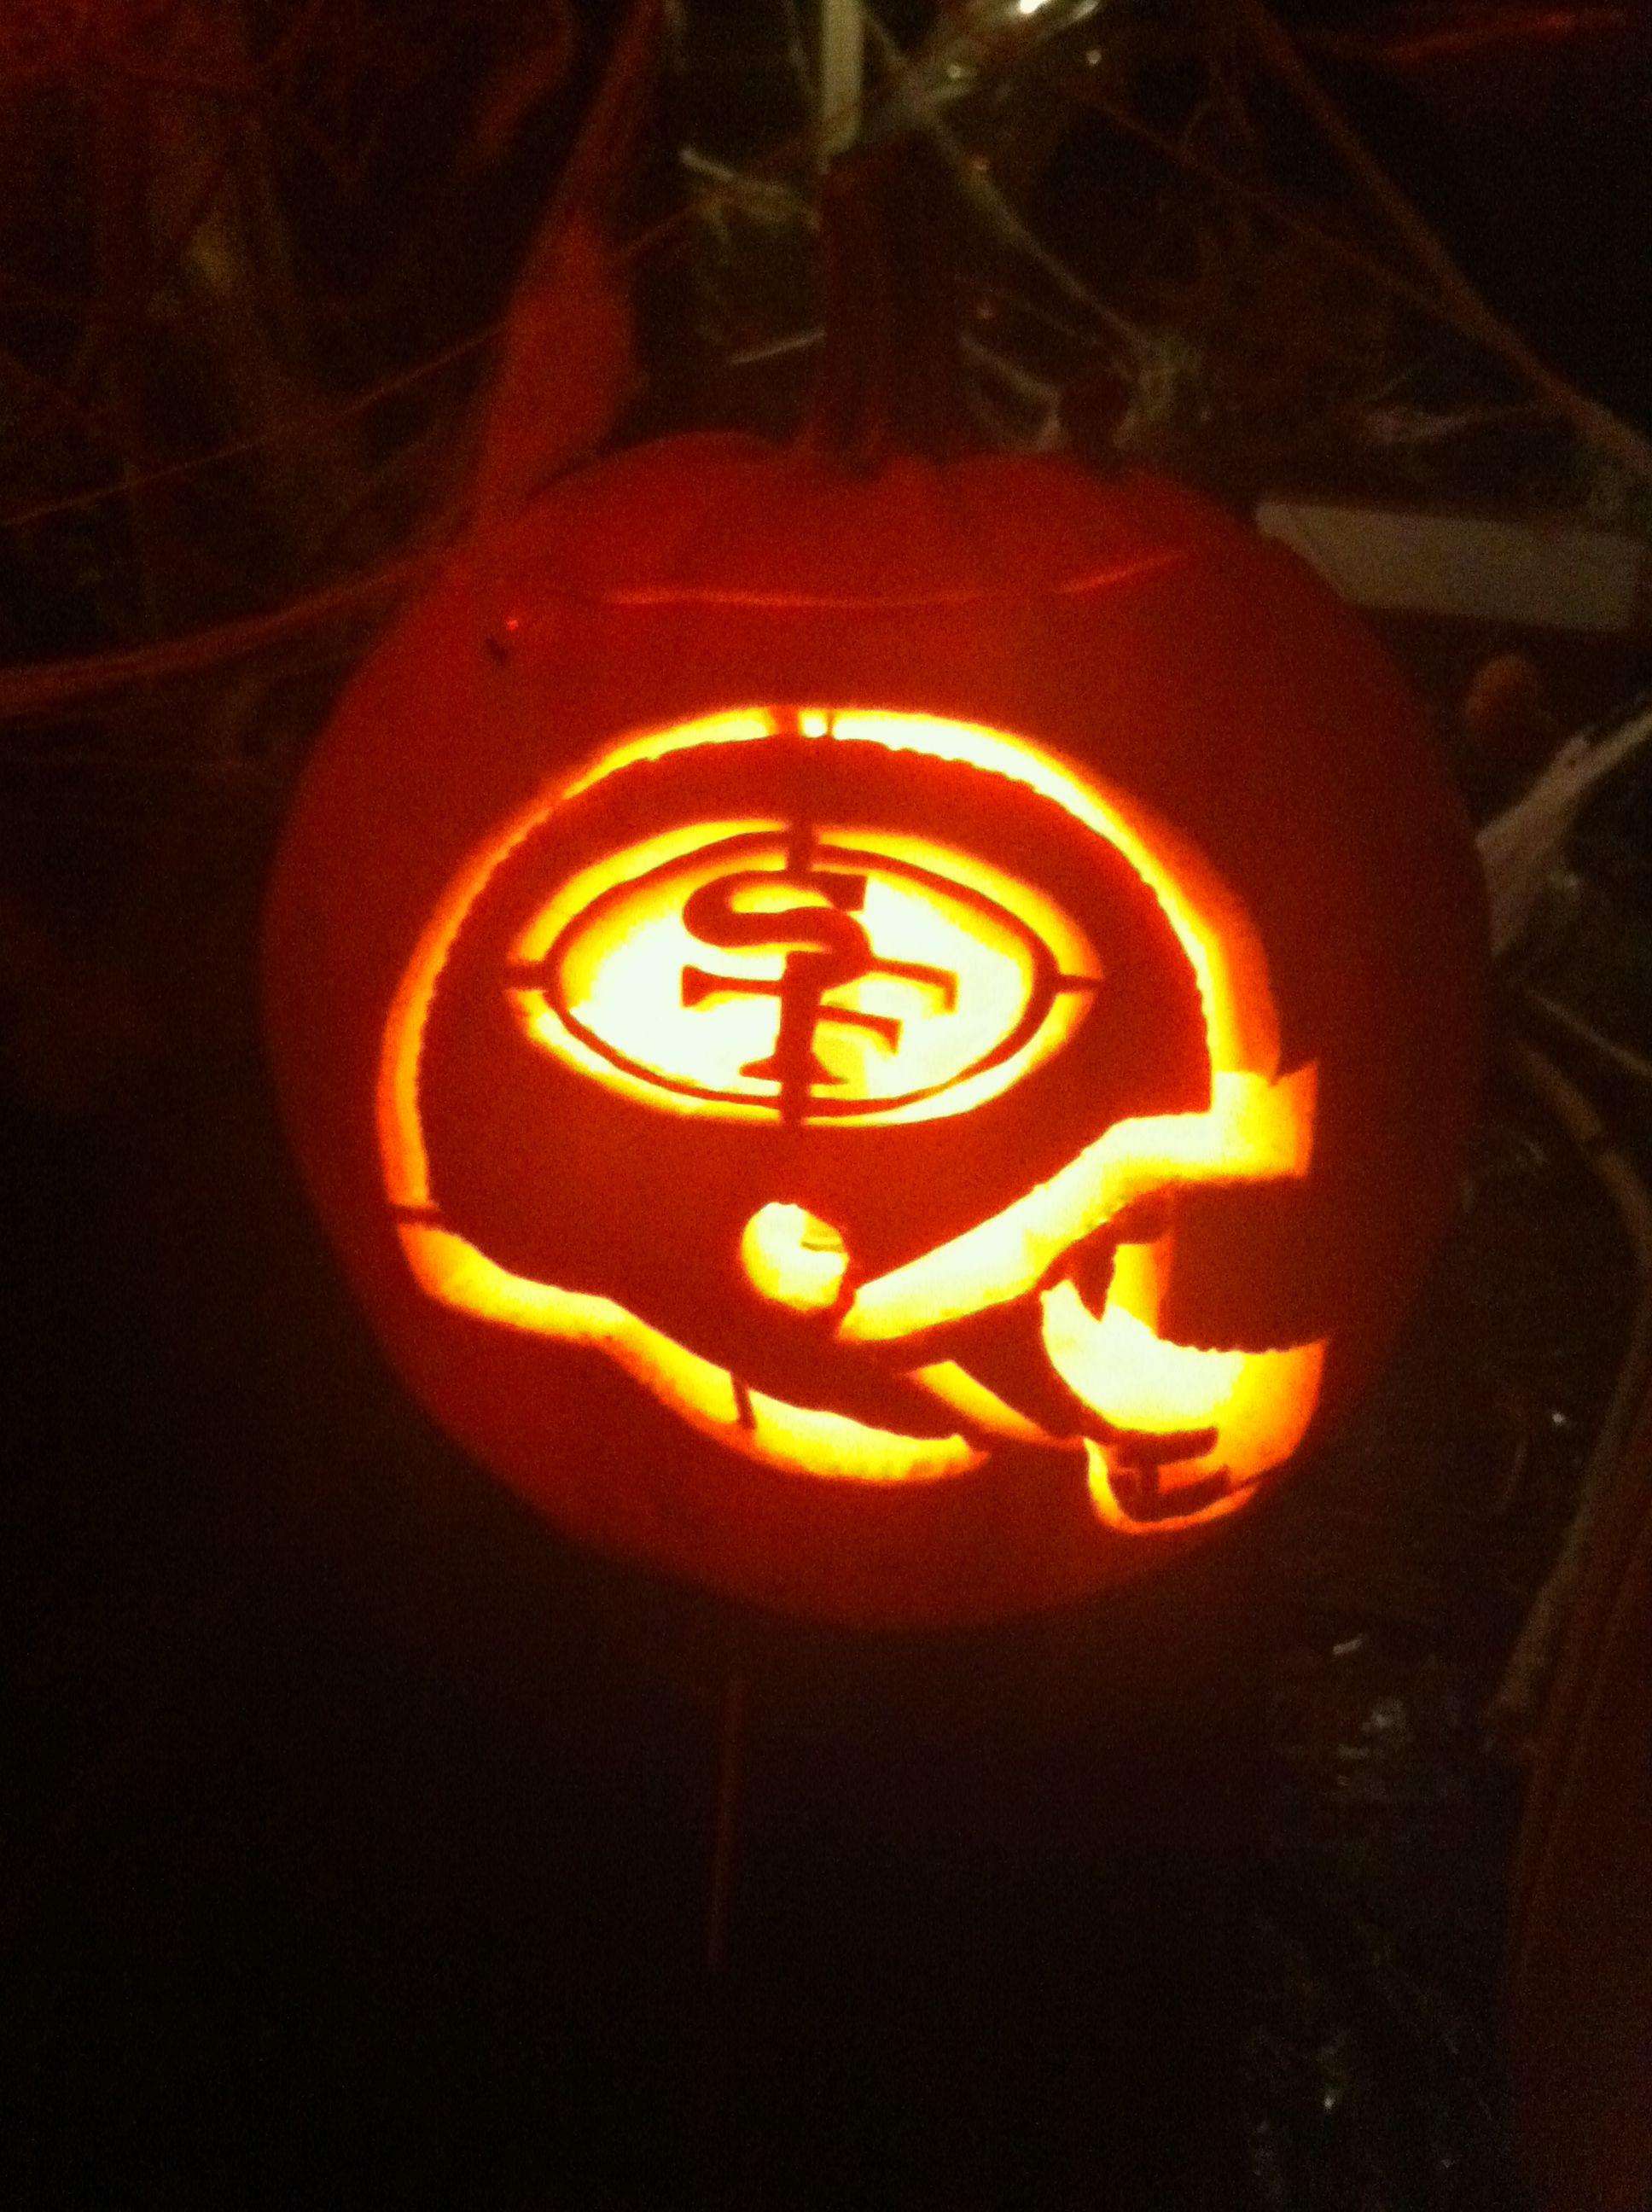 49ers pumpkin template  Gooo Niners! every year, i carve Sf Giants or Sf 5ers ...